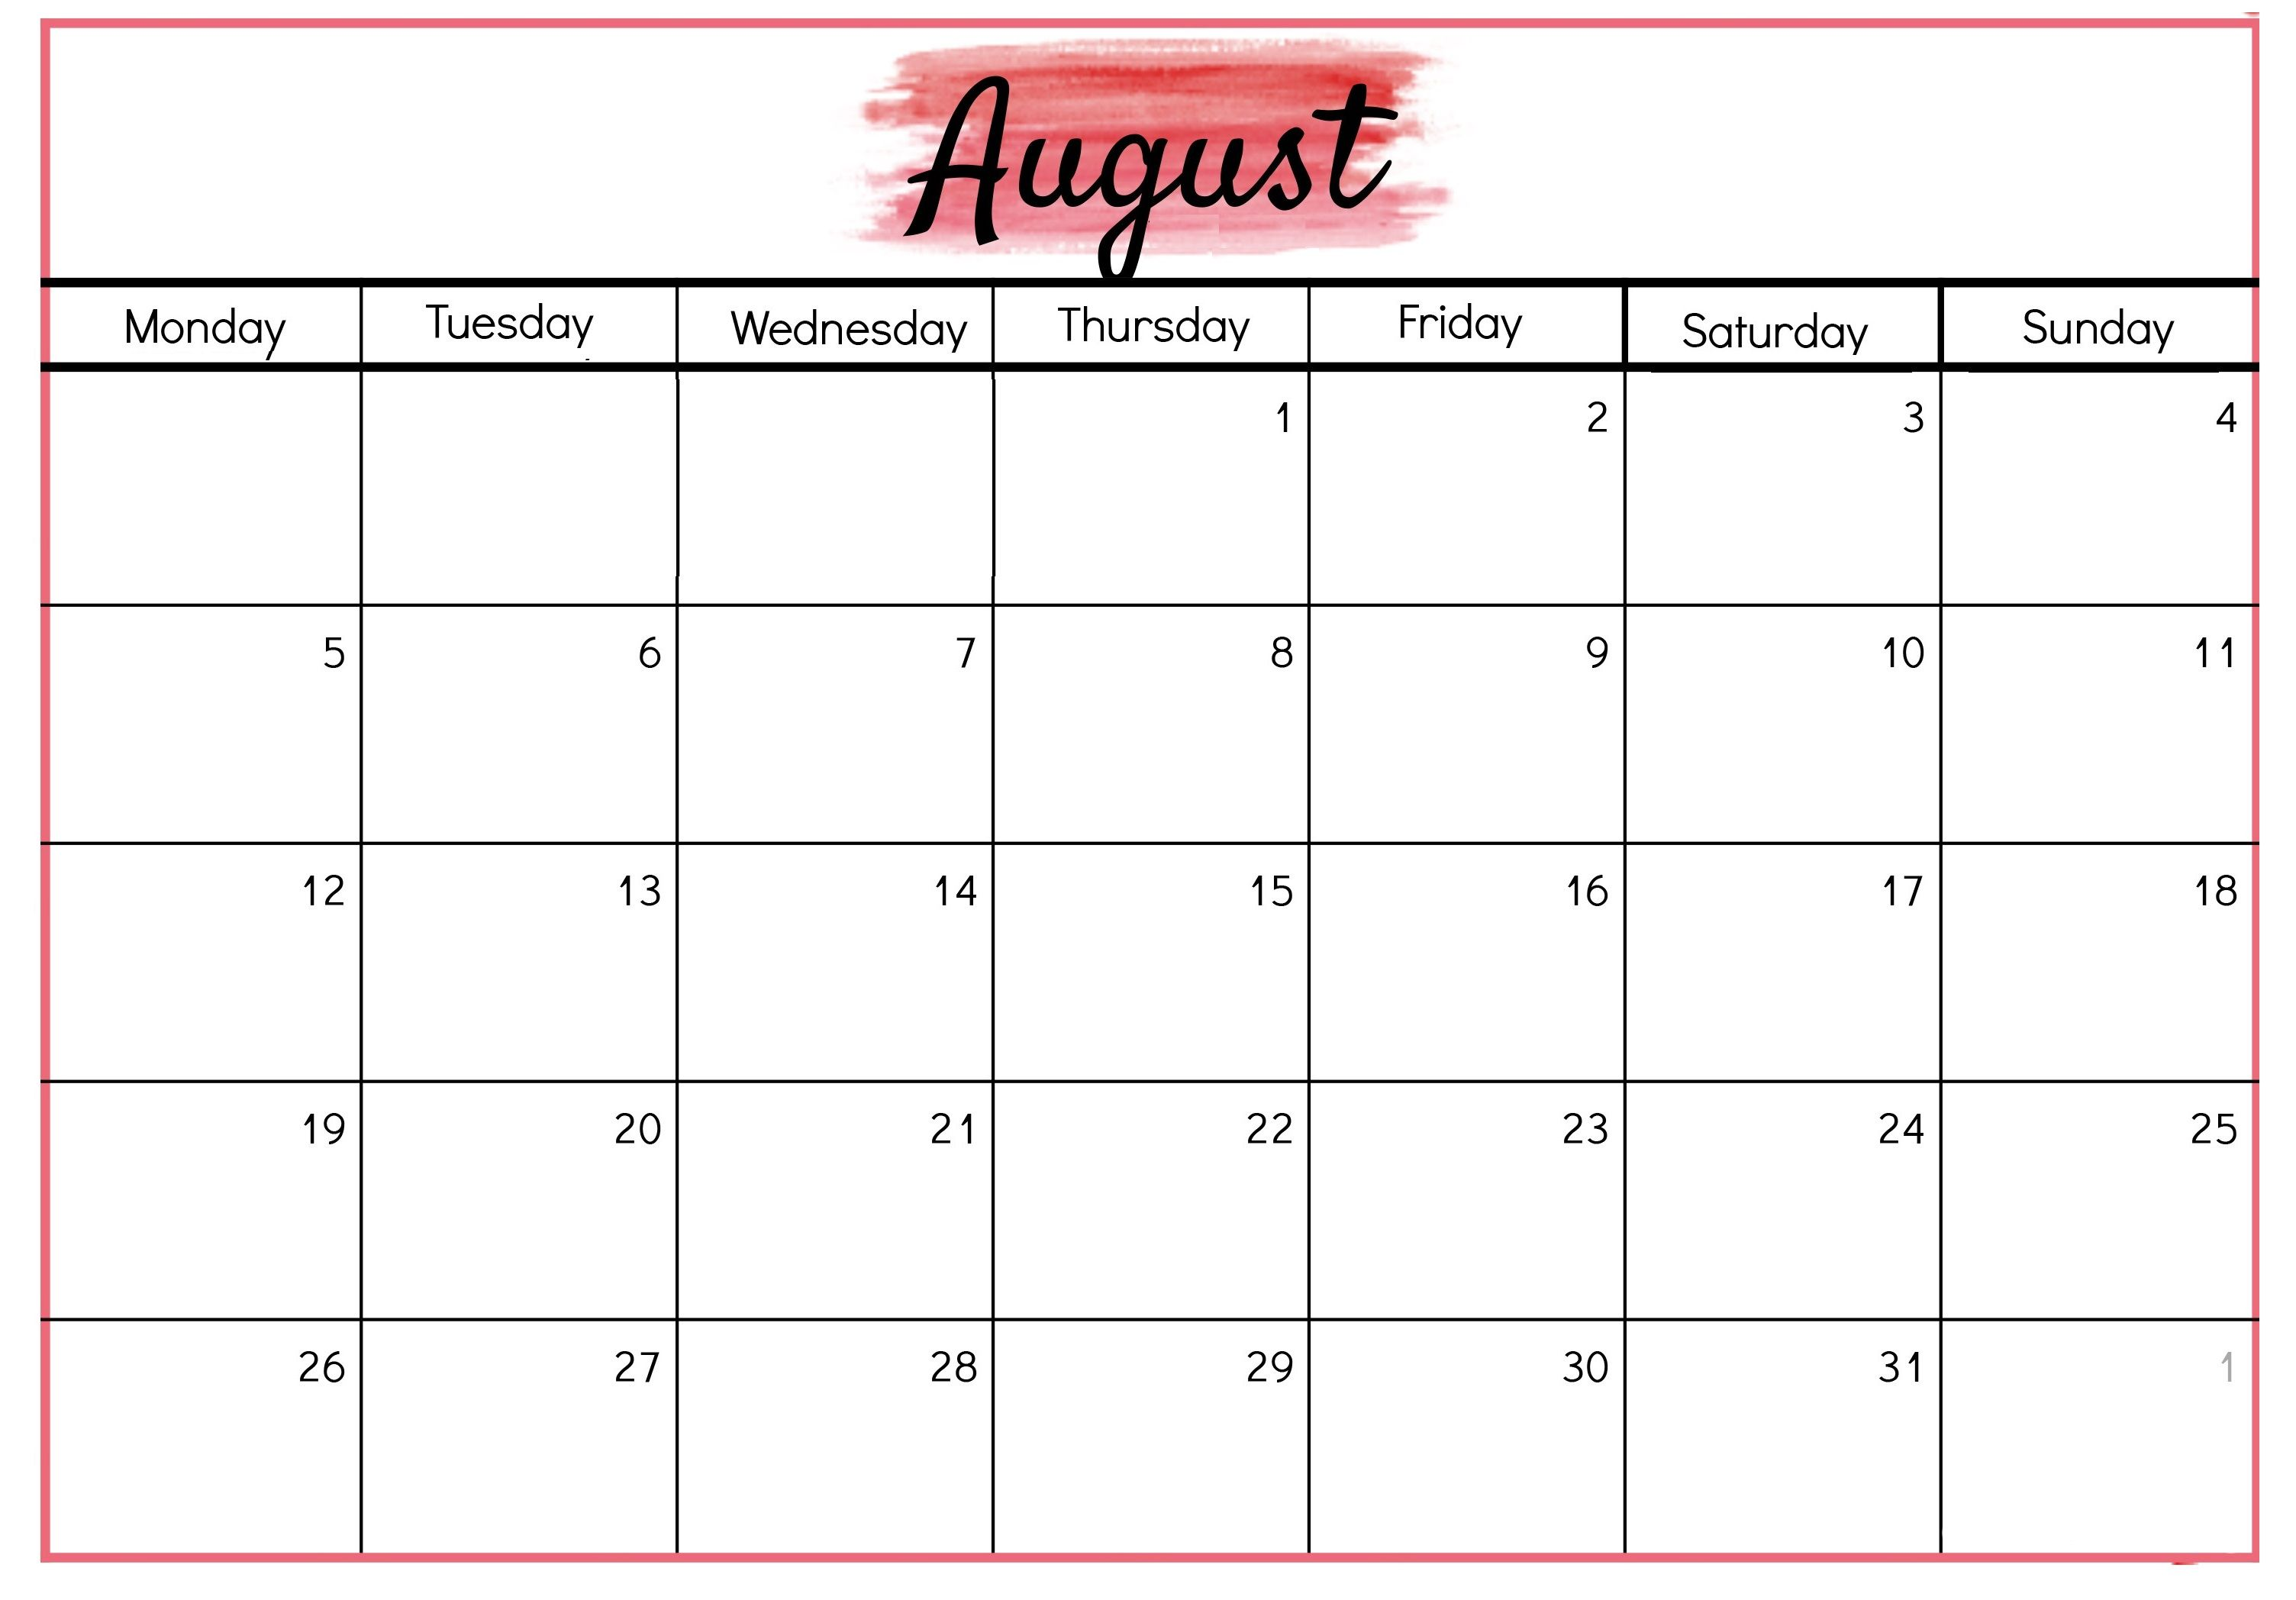 August 2019 Calendar With Holidays Calendar Printables Calendar